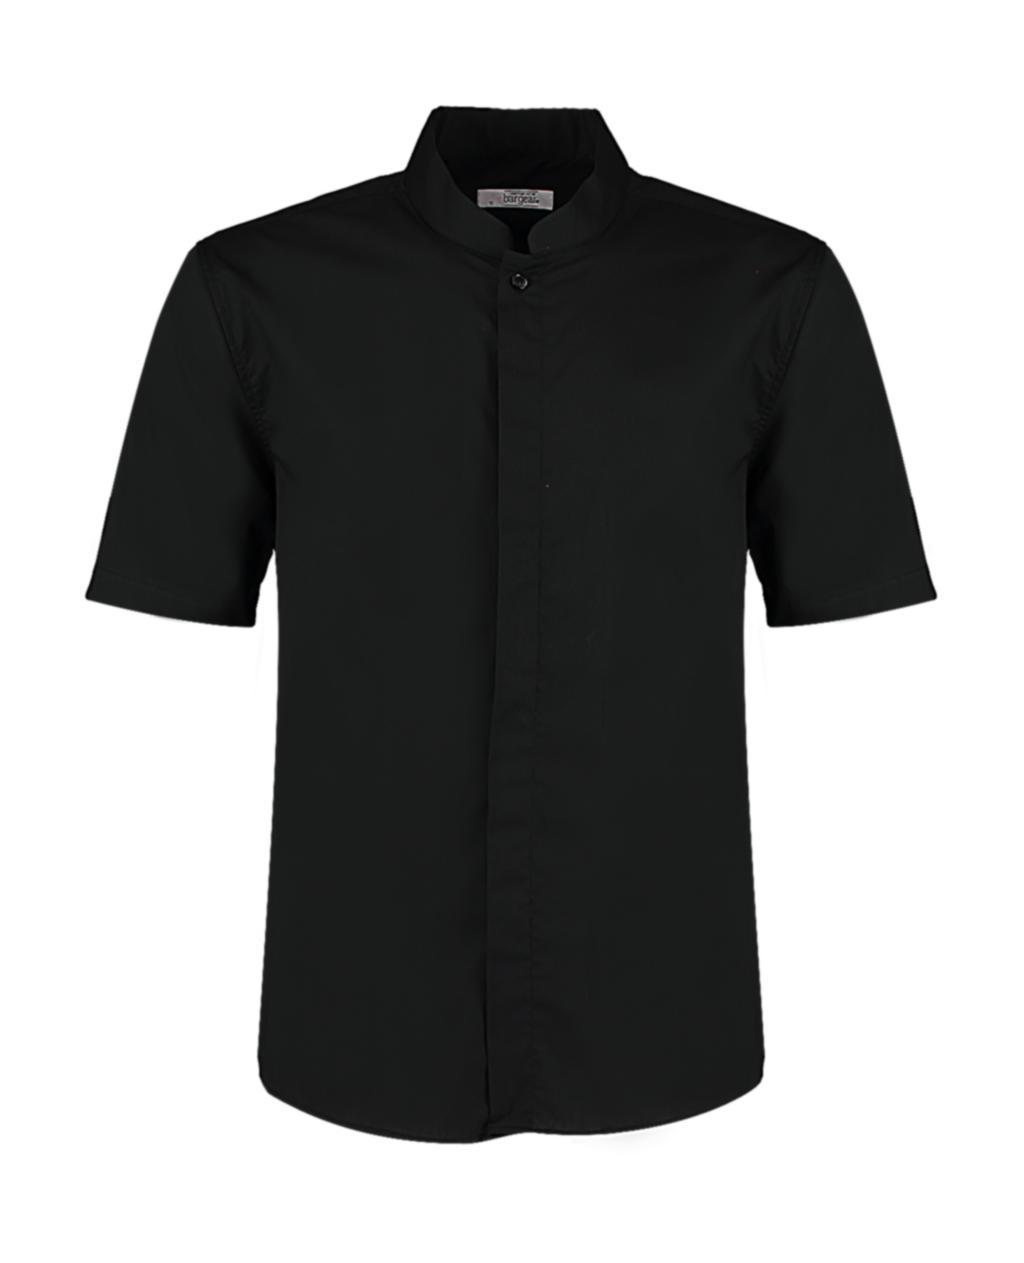 Košile Mandarin Collar Tailored fit s kr. ruk. - zvìtšit obrázek